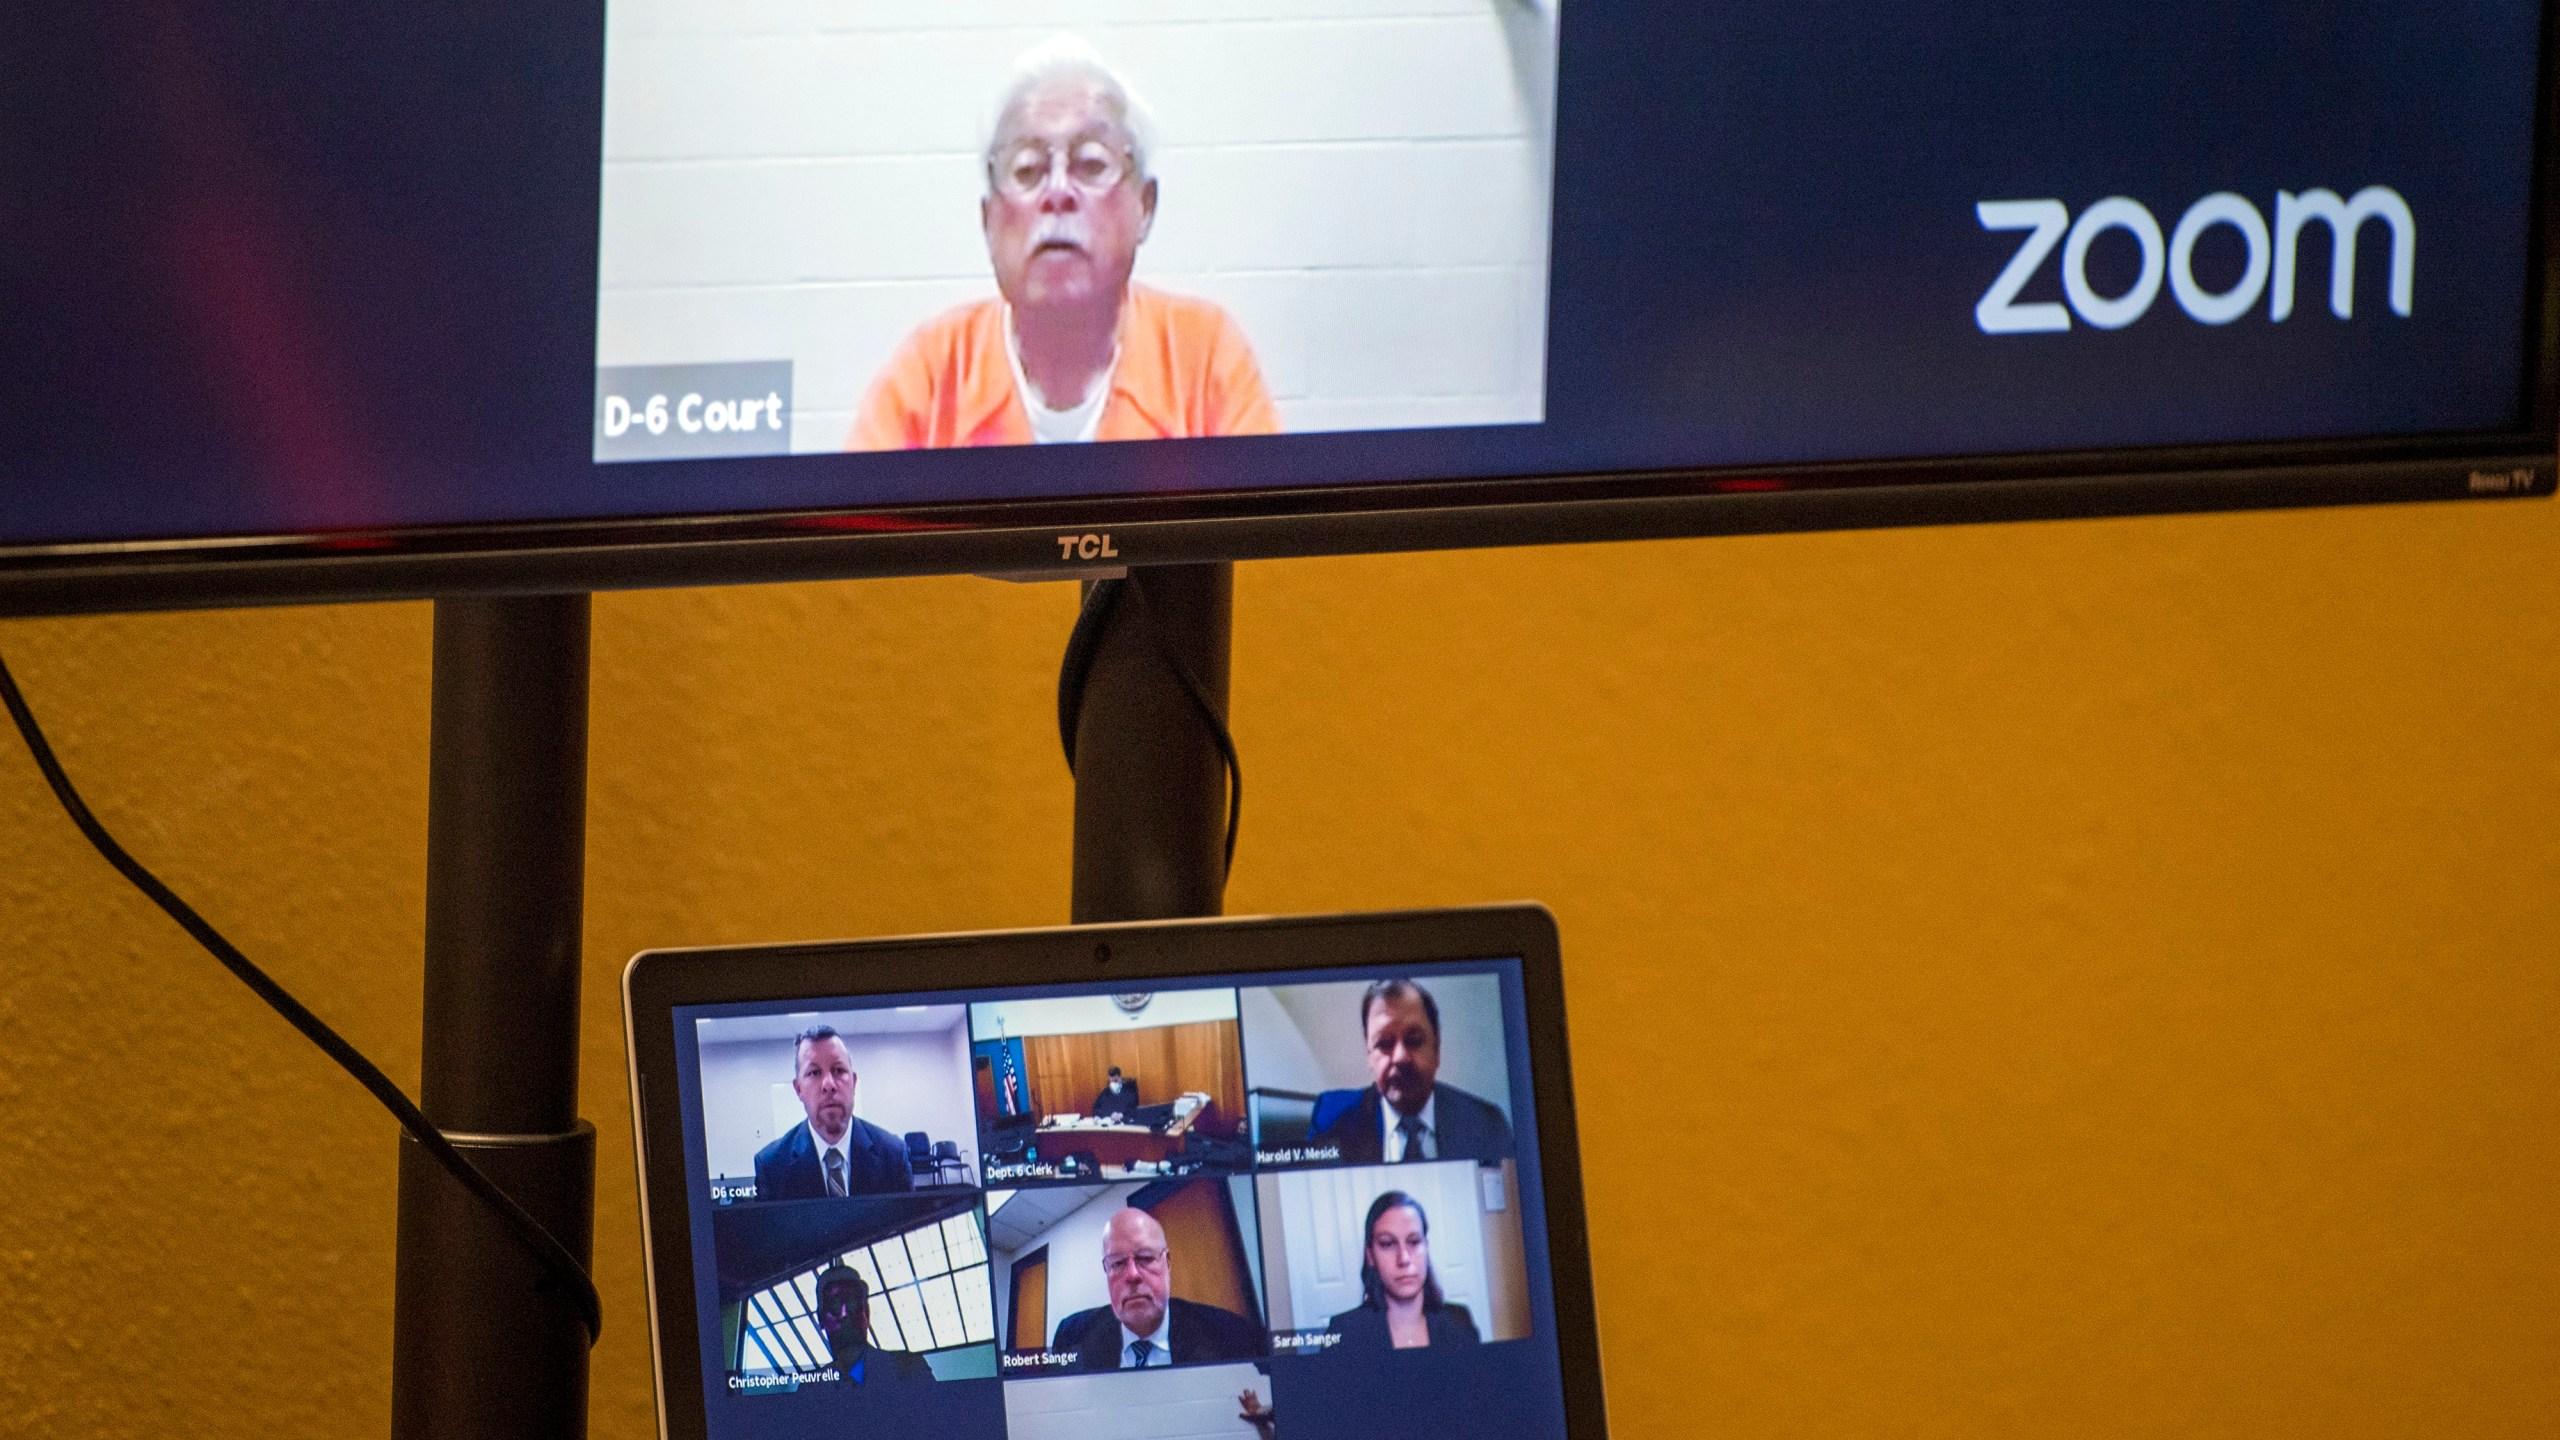 Defendant Ruben Flores appears via video conference during his arraignment, Thursday, April 15, 2021, in San Luis Obispo Superior Court in San Luis Obispo. (AP Photo/Nic Coury)